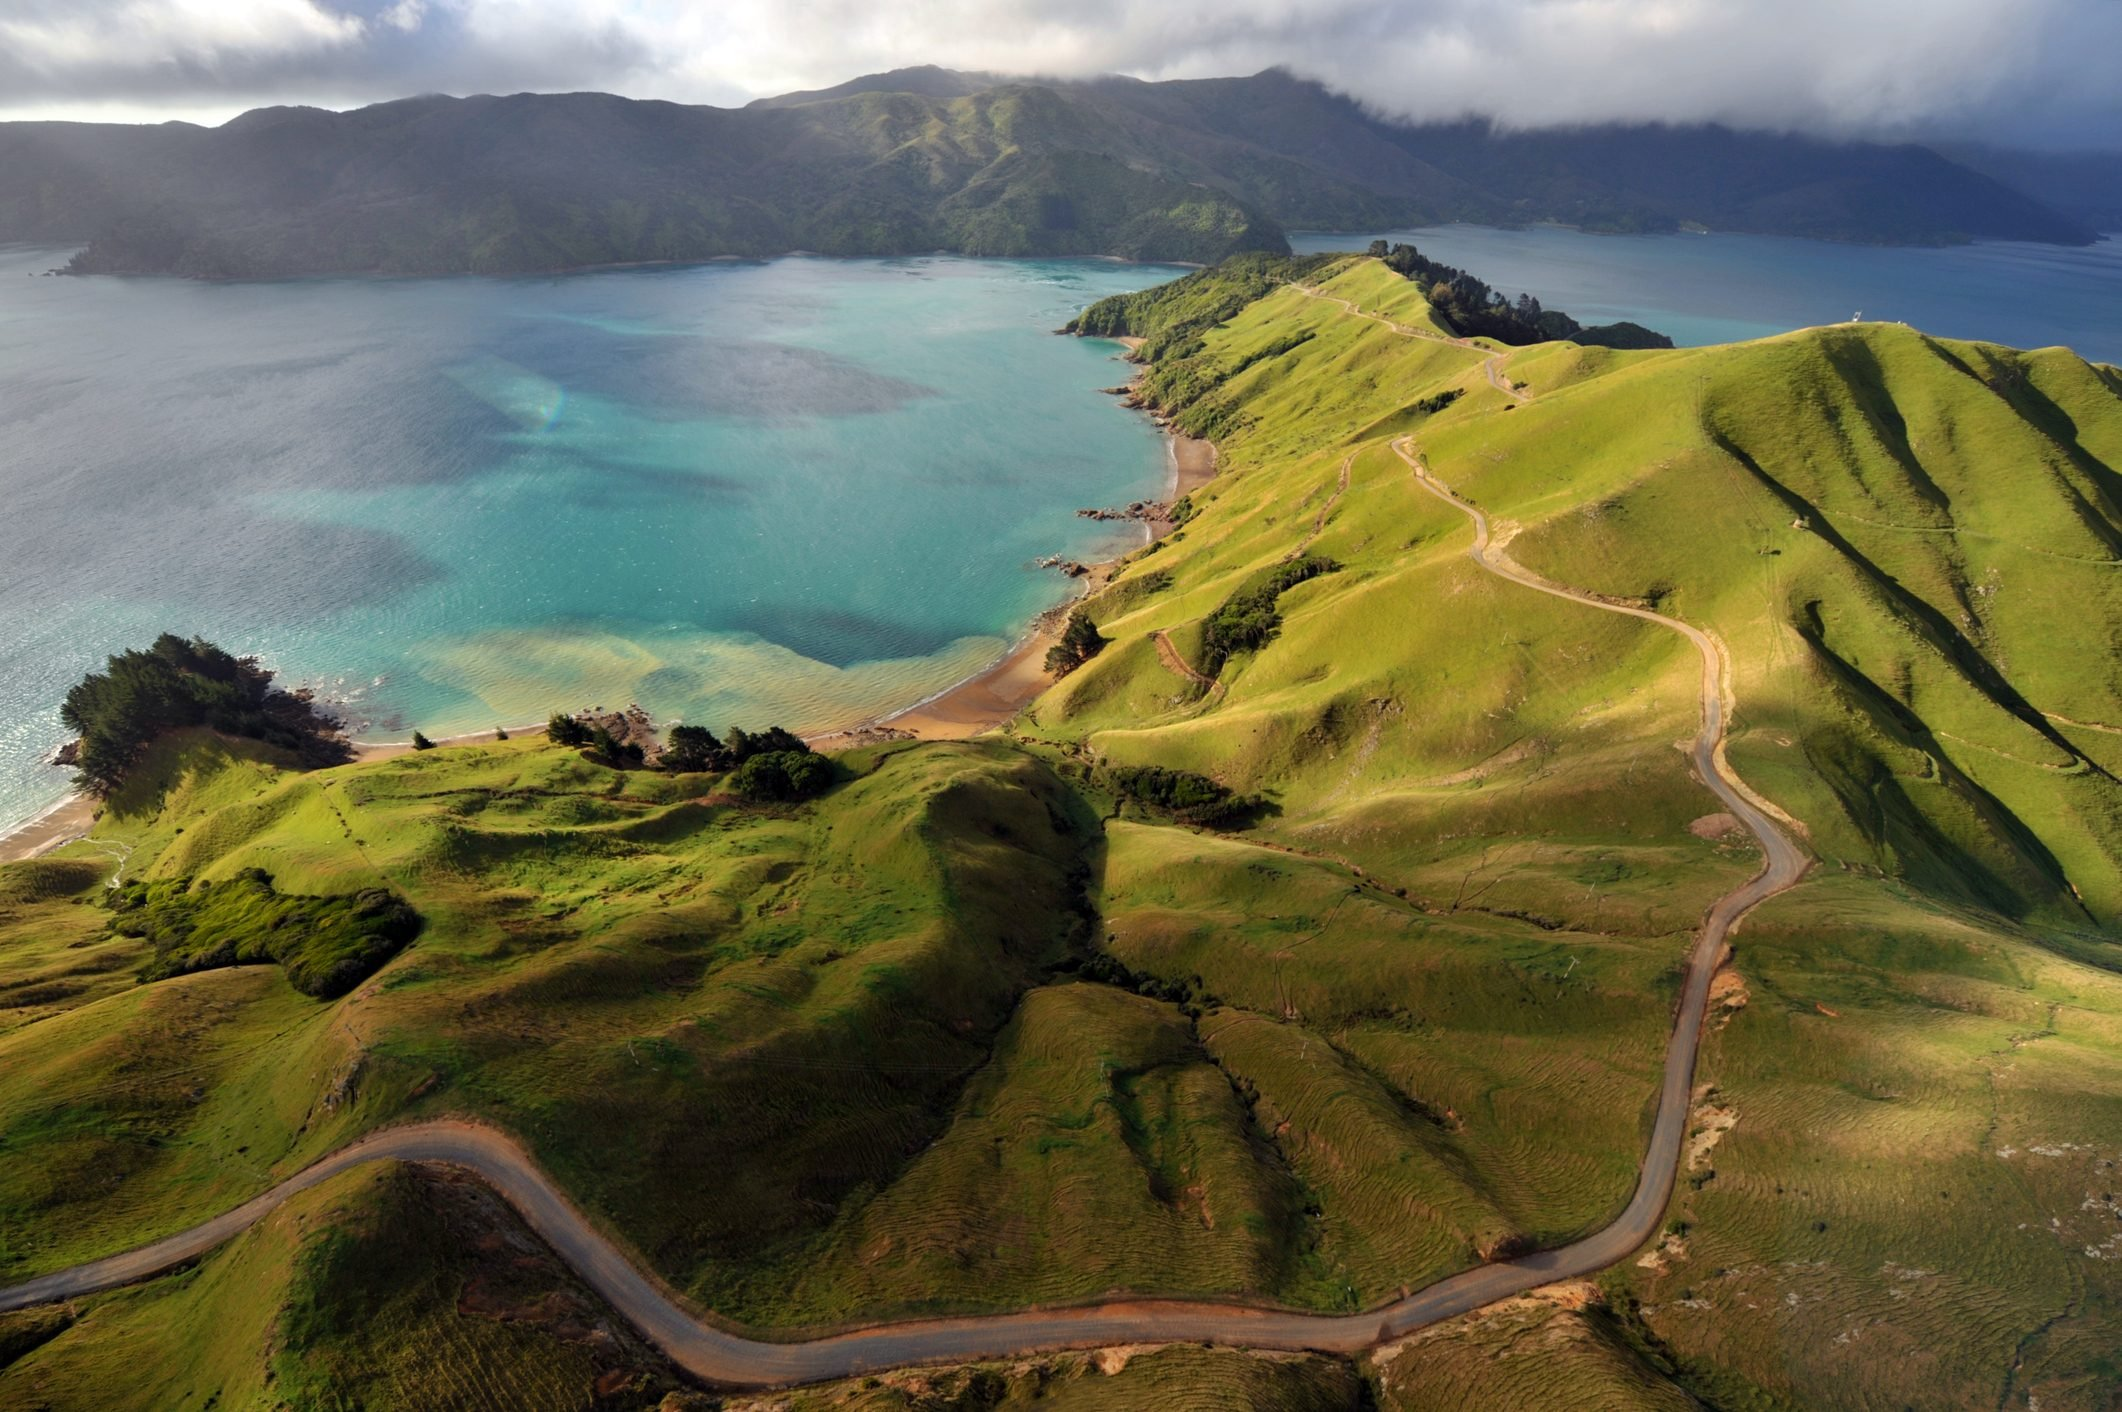 Aerial view of Marlborough Sounds